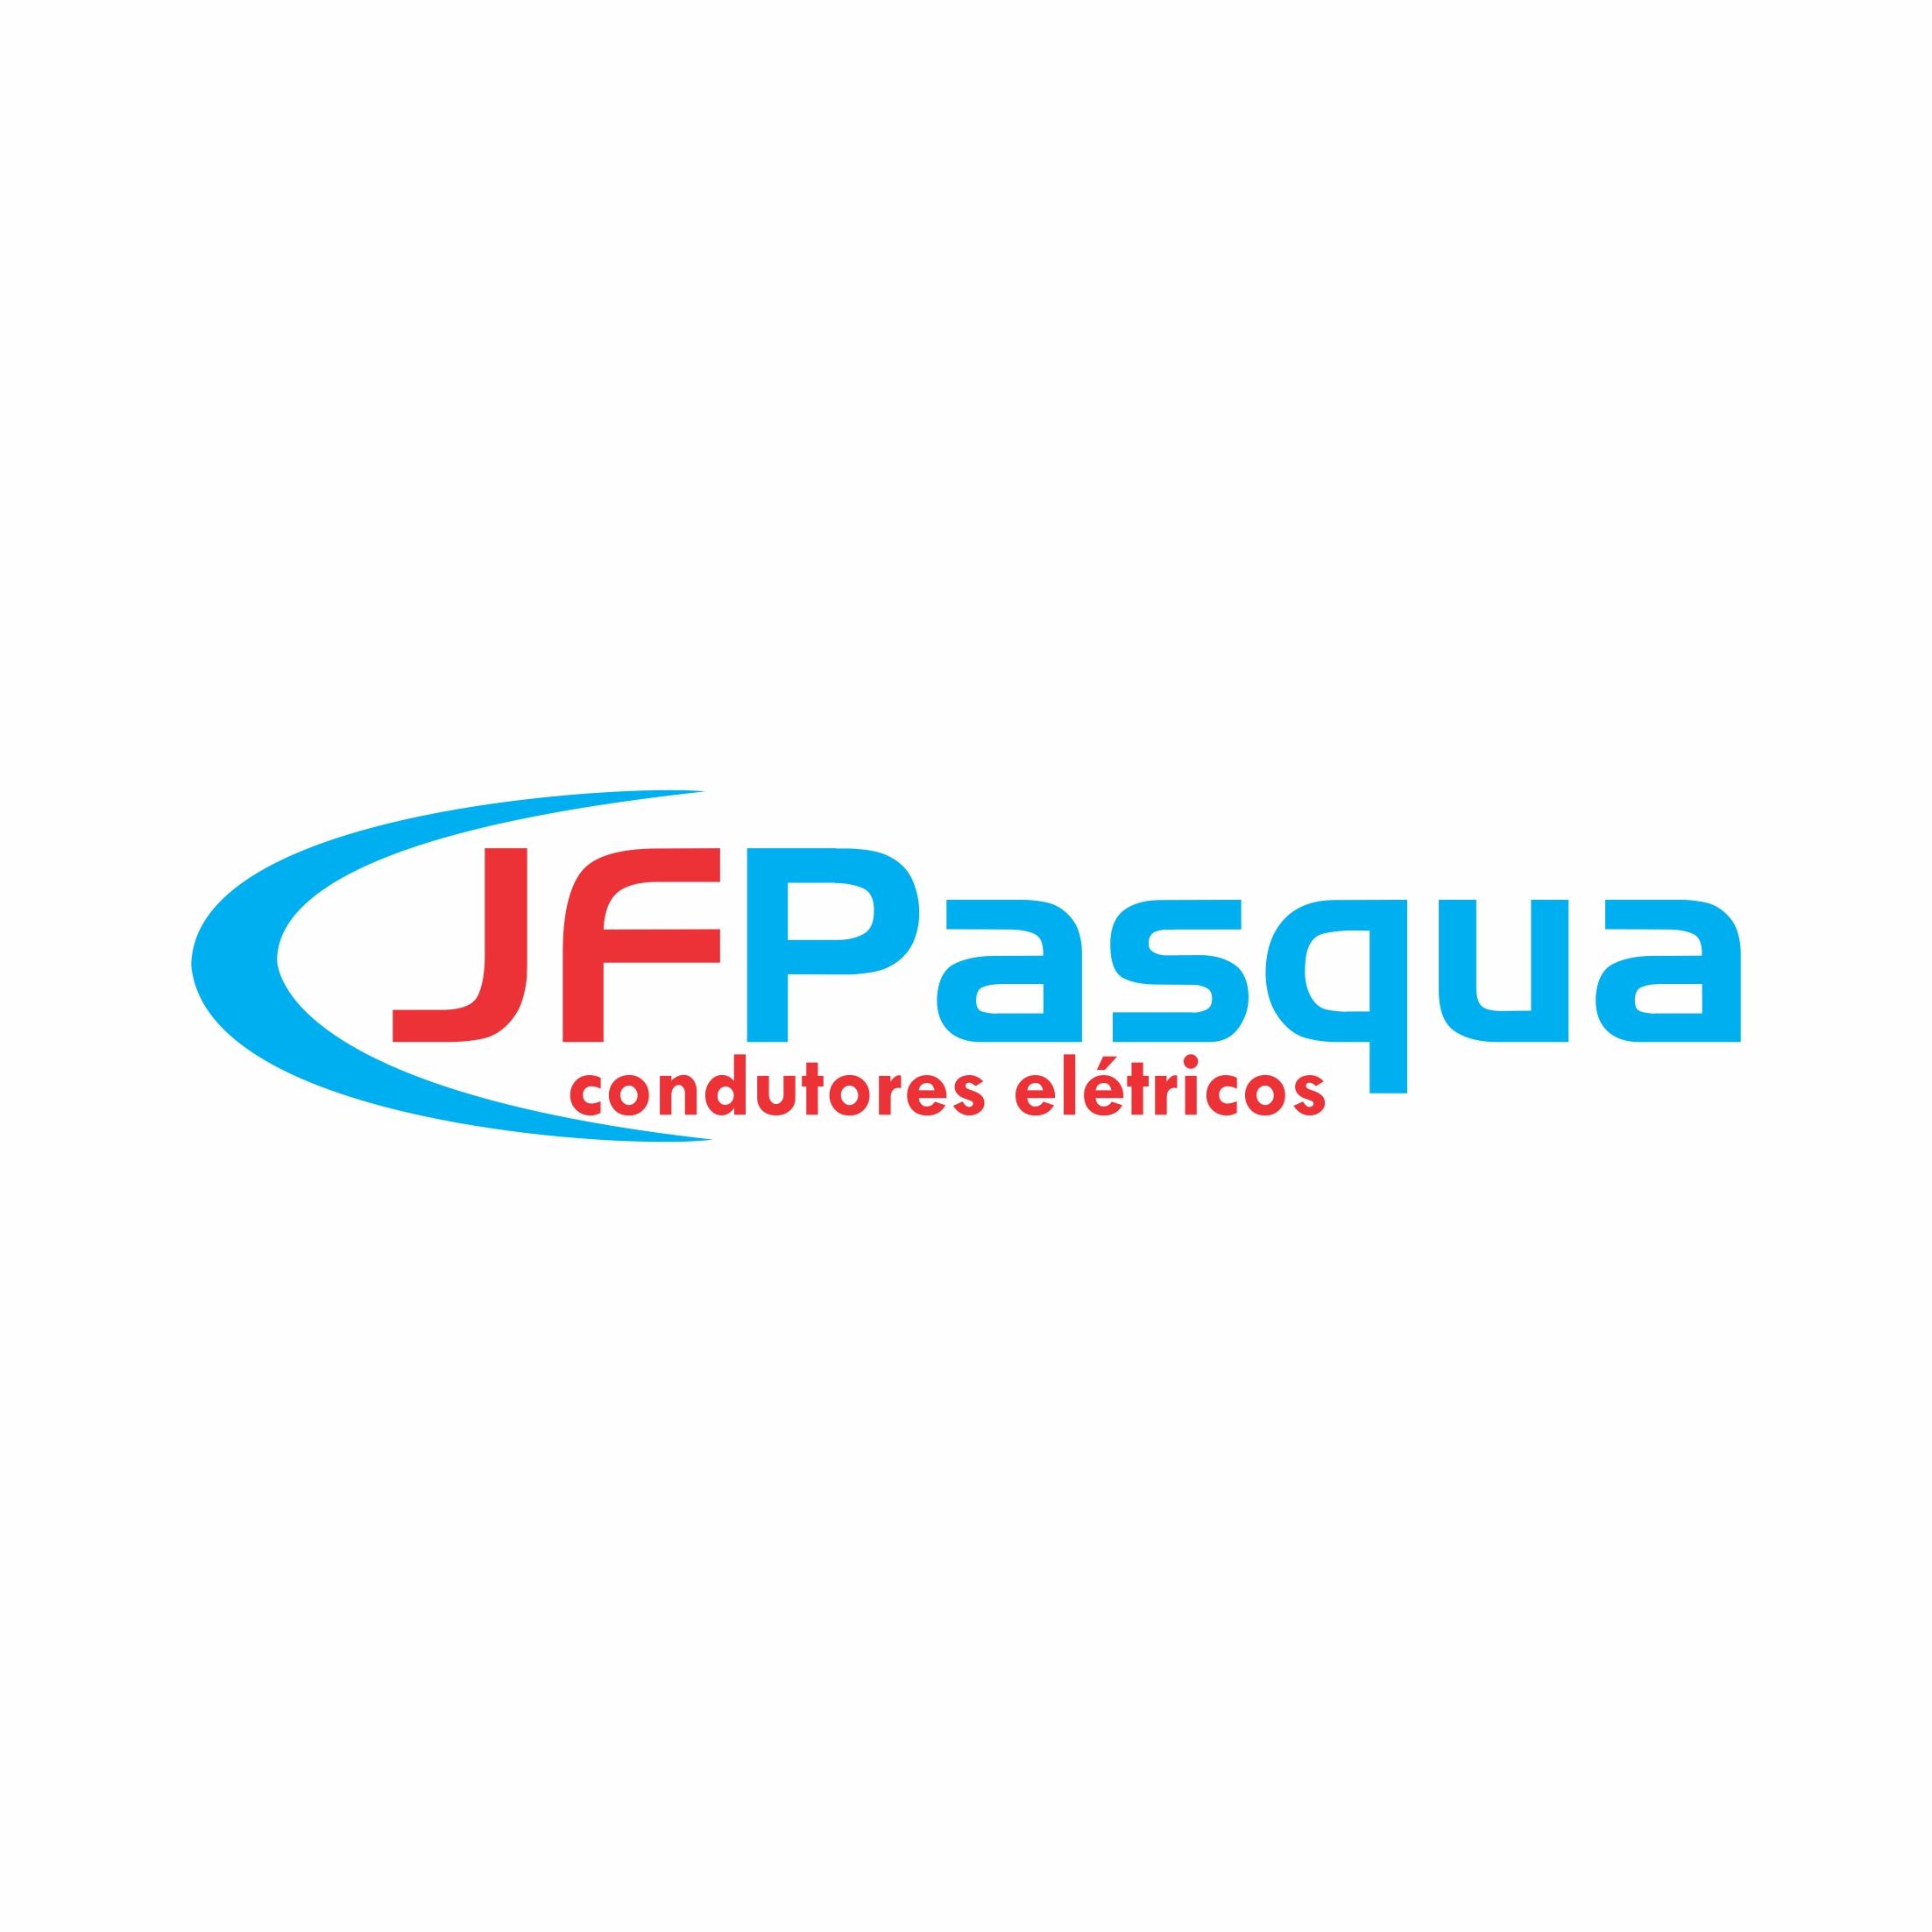 JF Pasqua